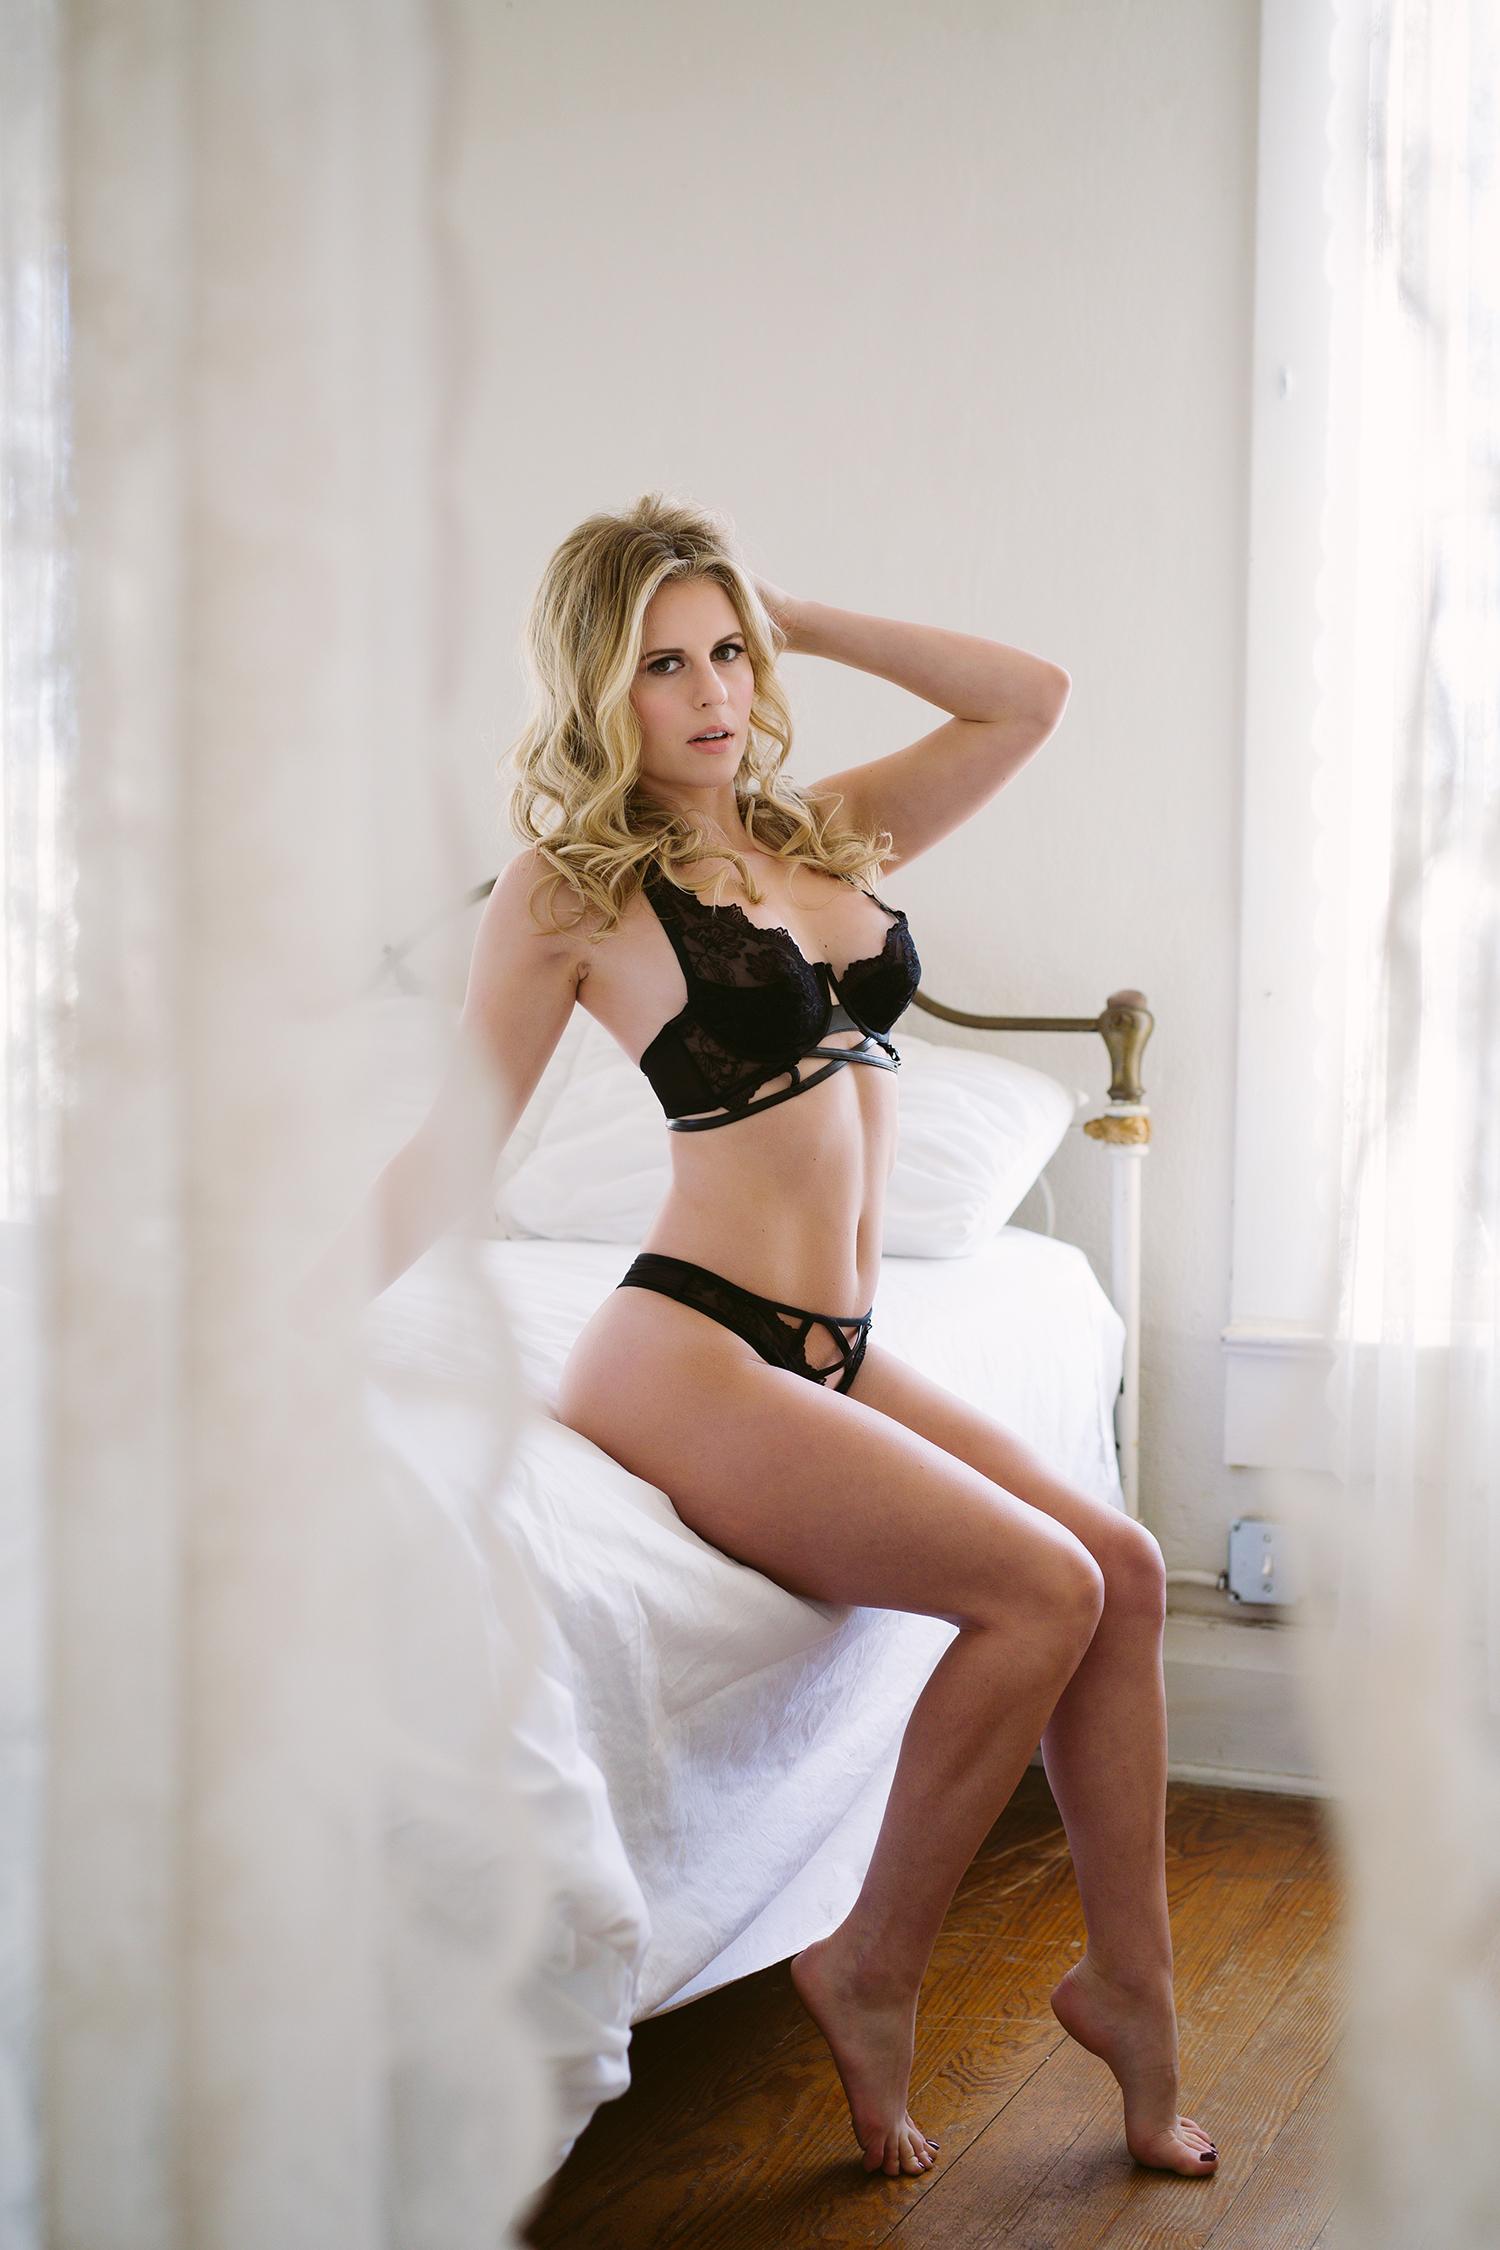 austin-bridal-boudoir-kimberly-brooke-16.jpg